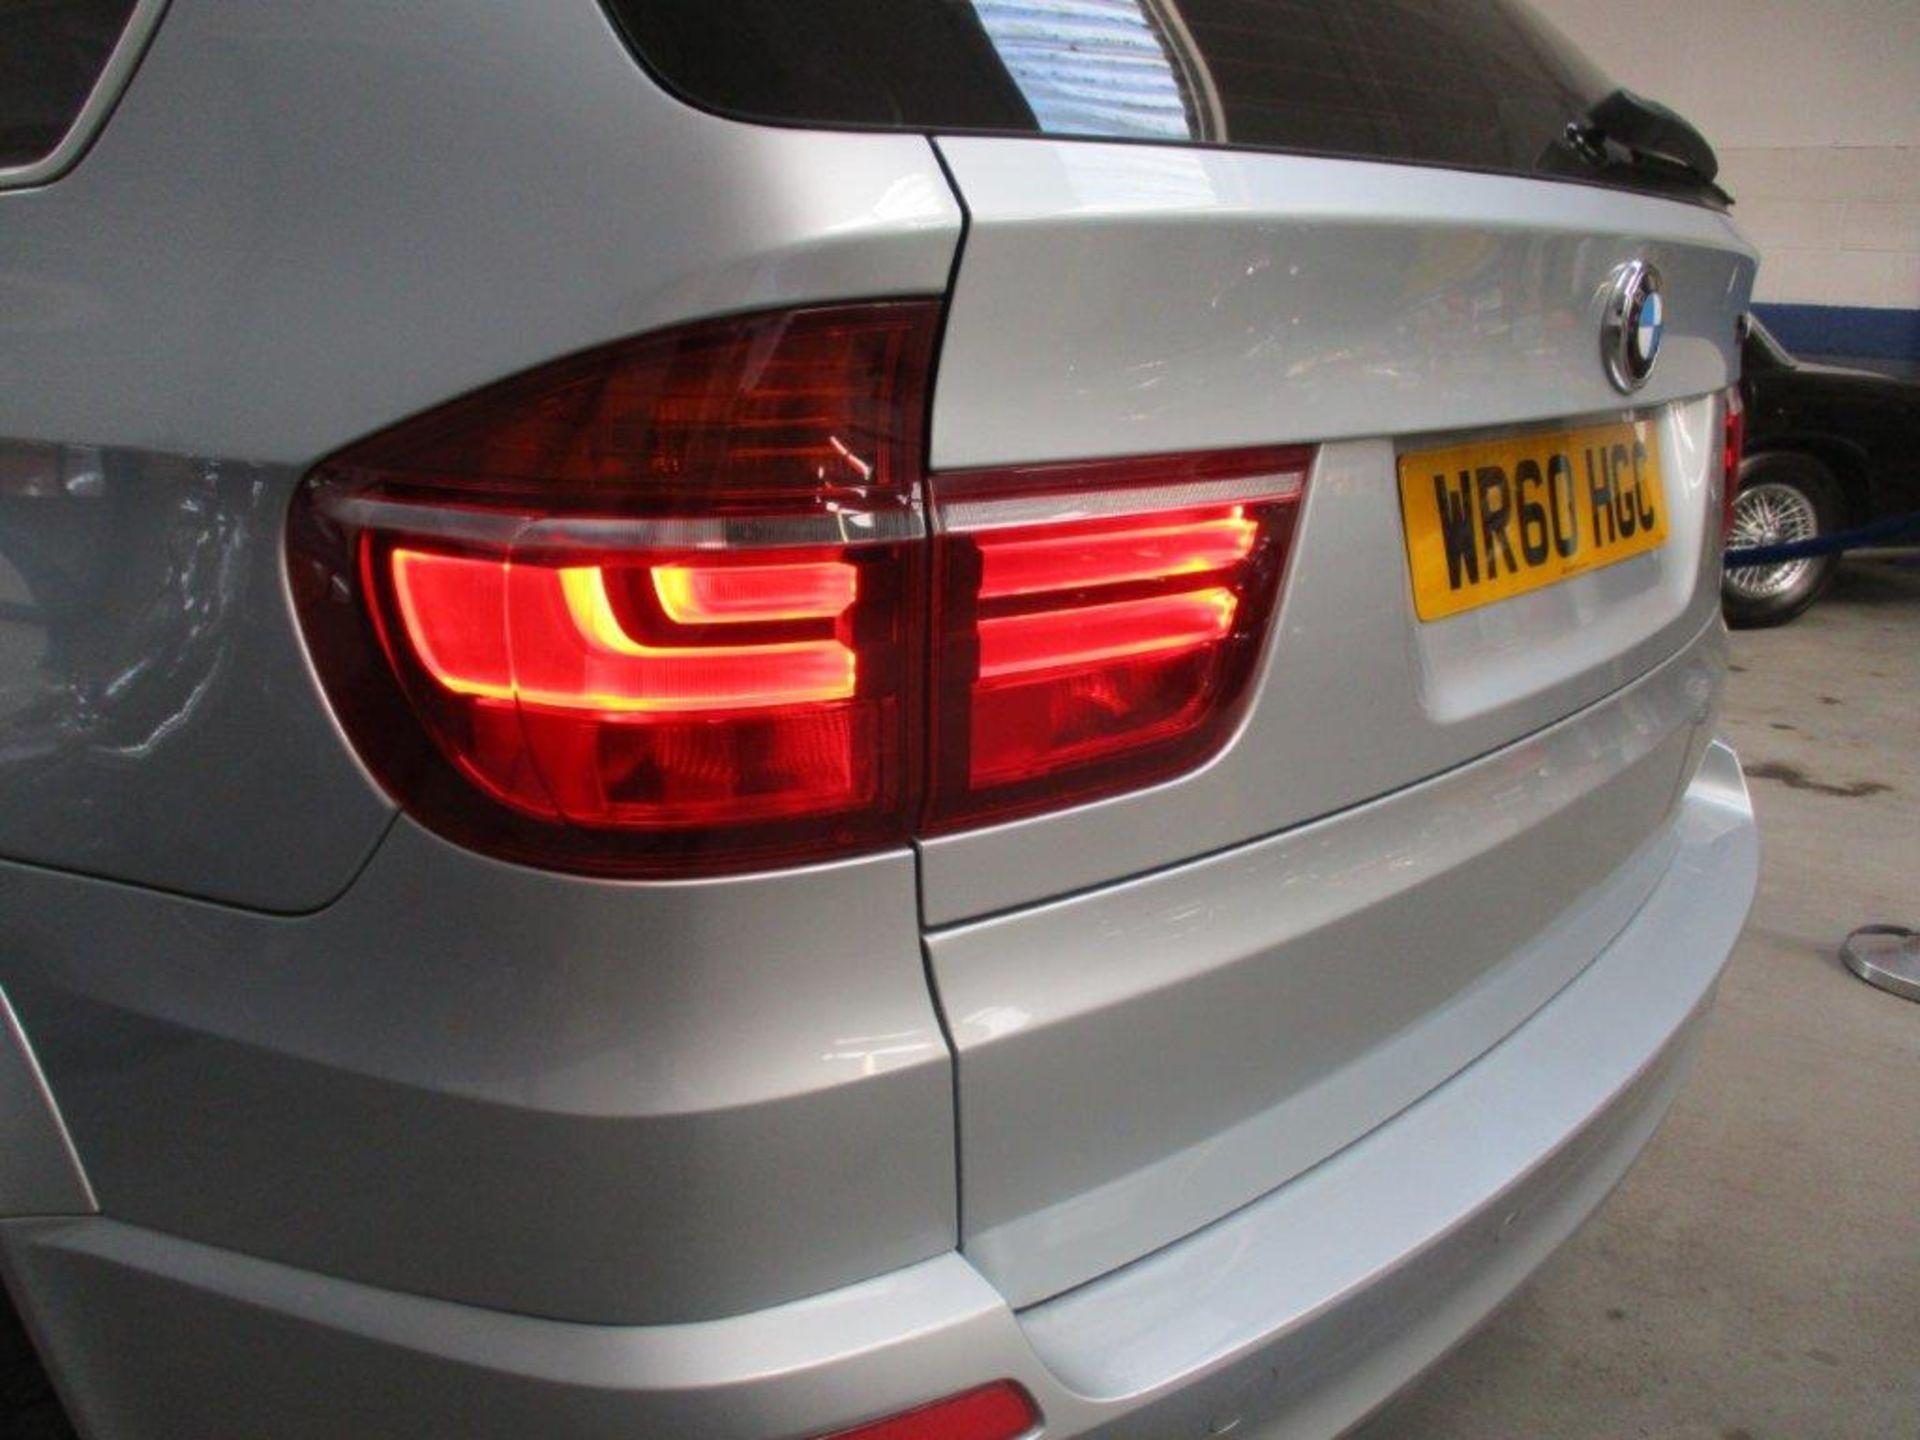 60 10 BMW X5 M Turbo Auto - Image 8 of 35